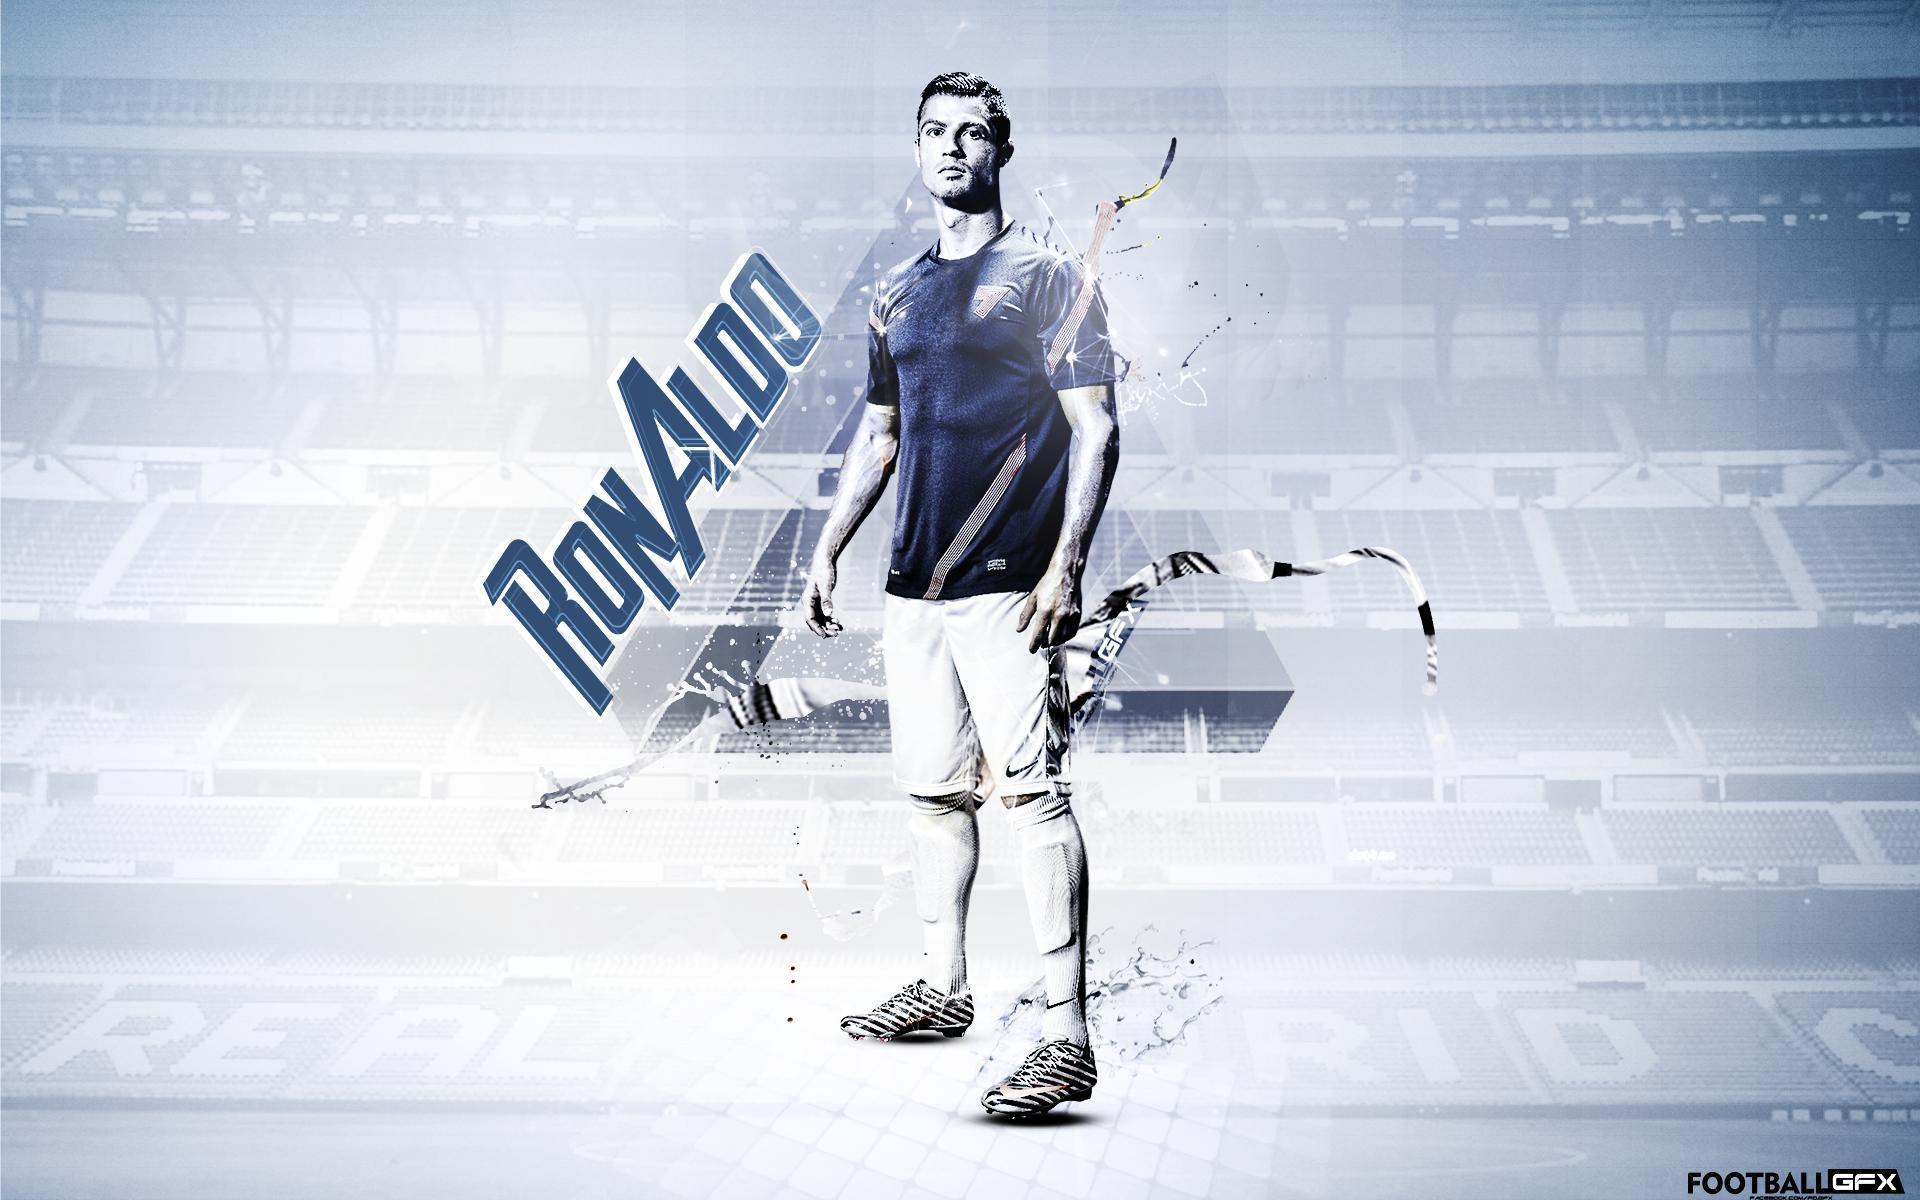 Real Madrid D Cristiano Ronaldo Wallpapers 2015 Nike Wallpaper Cave